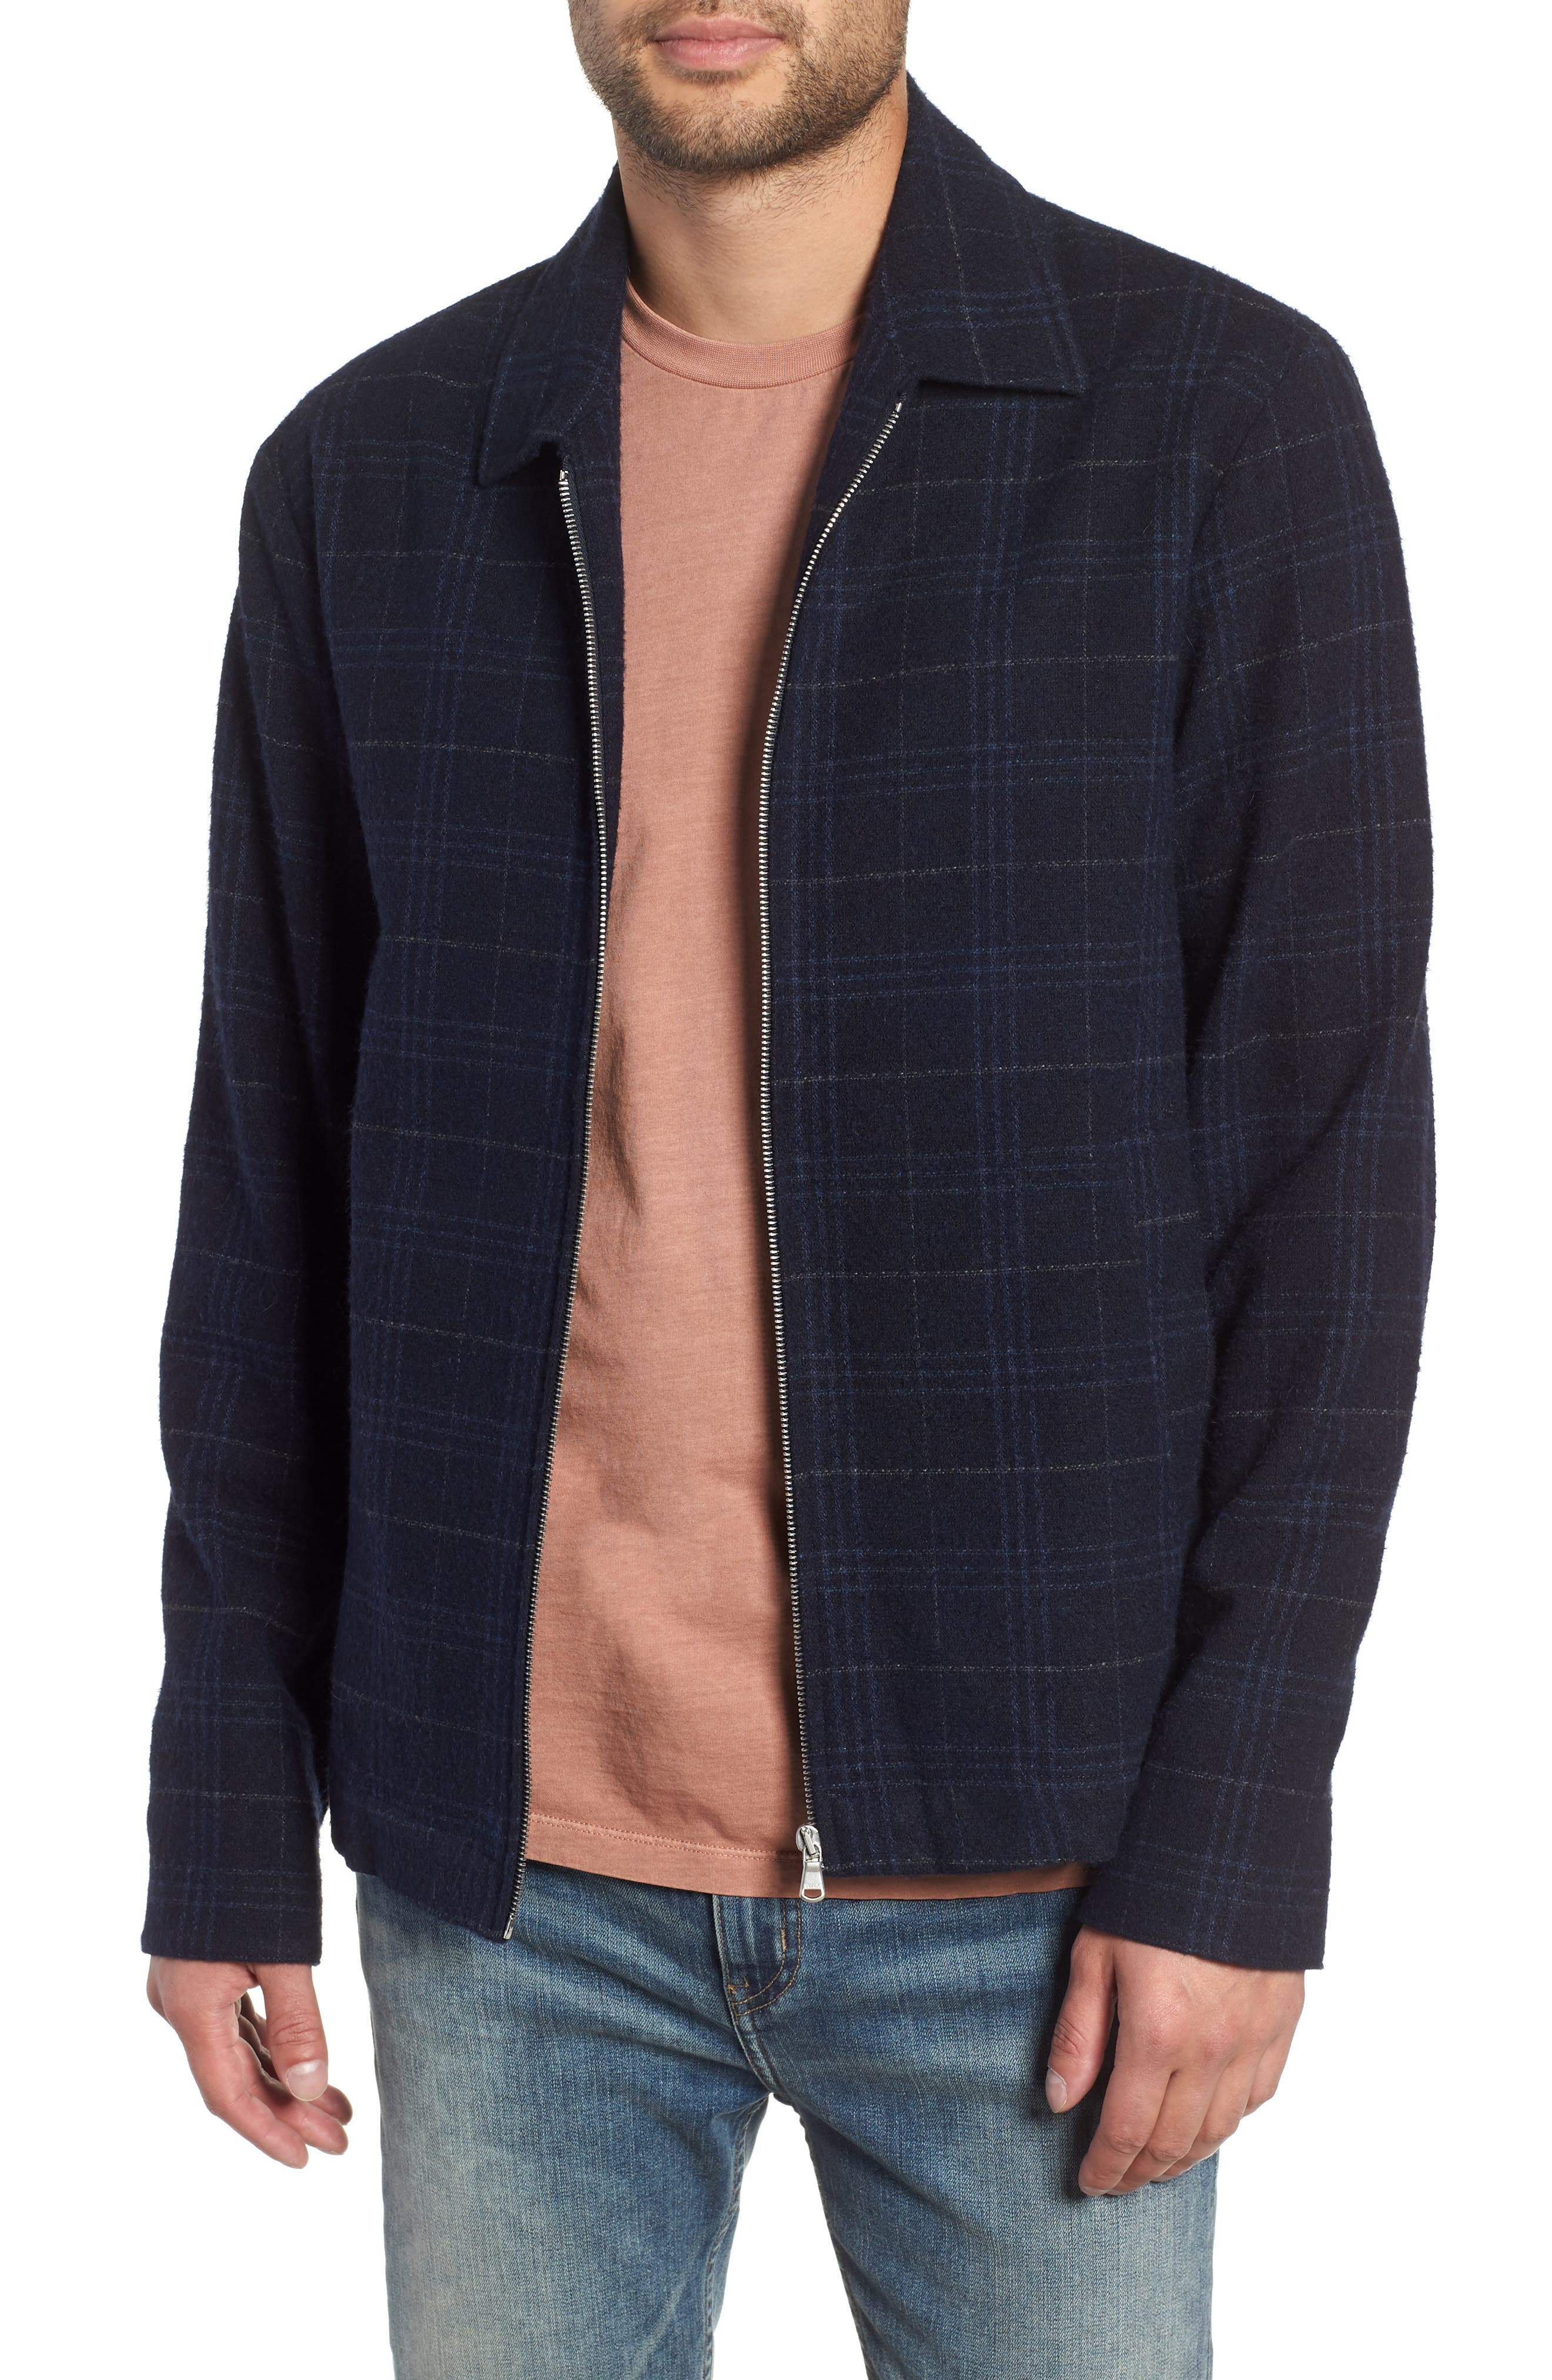 WAX LONDON,                             Witham Coach's Jacket,                             Main thumbnail 1, color,                             NAVY CHECK